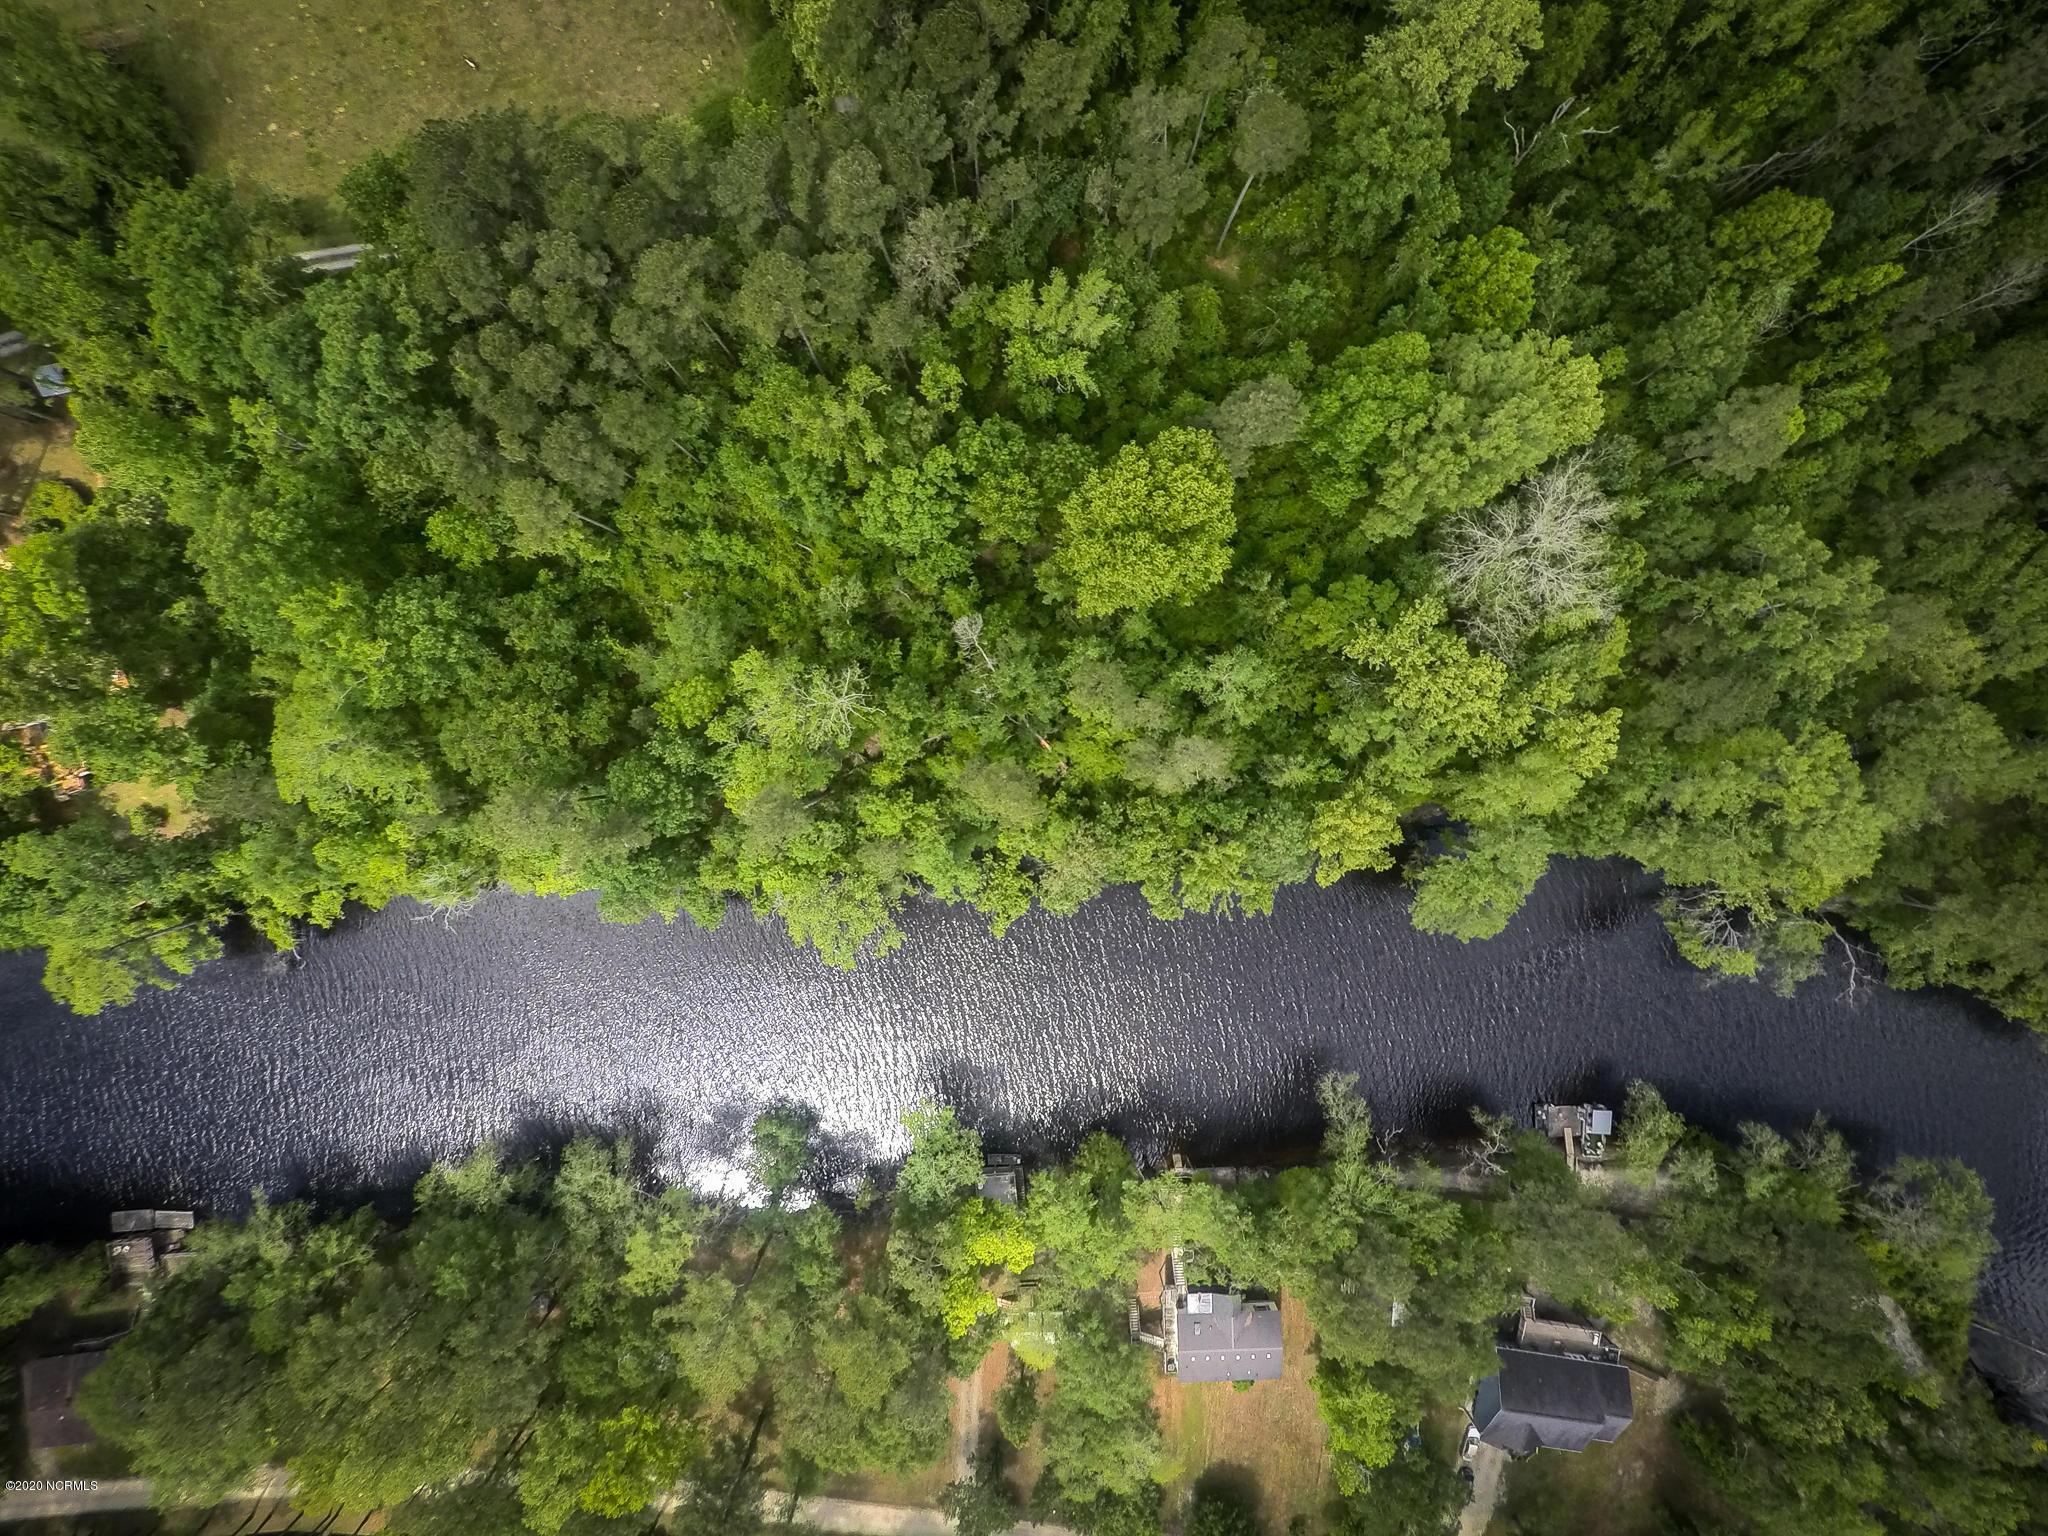 Tbd Hickory Hills Lane, Burgaw, North Carolina 28425, ,Residential land,For sale,Hickory Hills,100216013